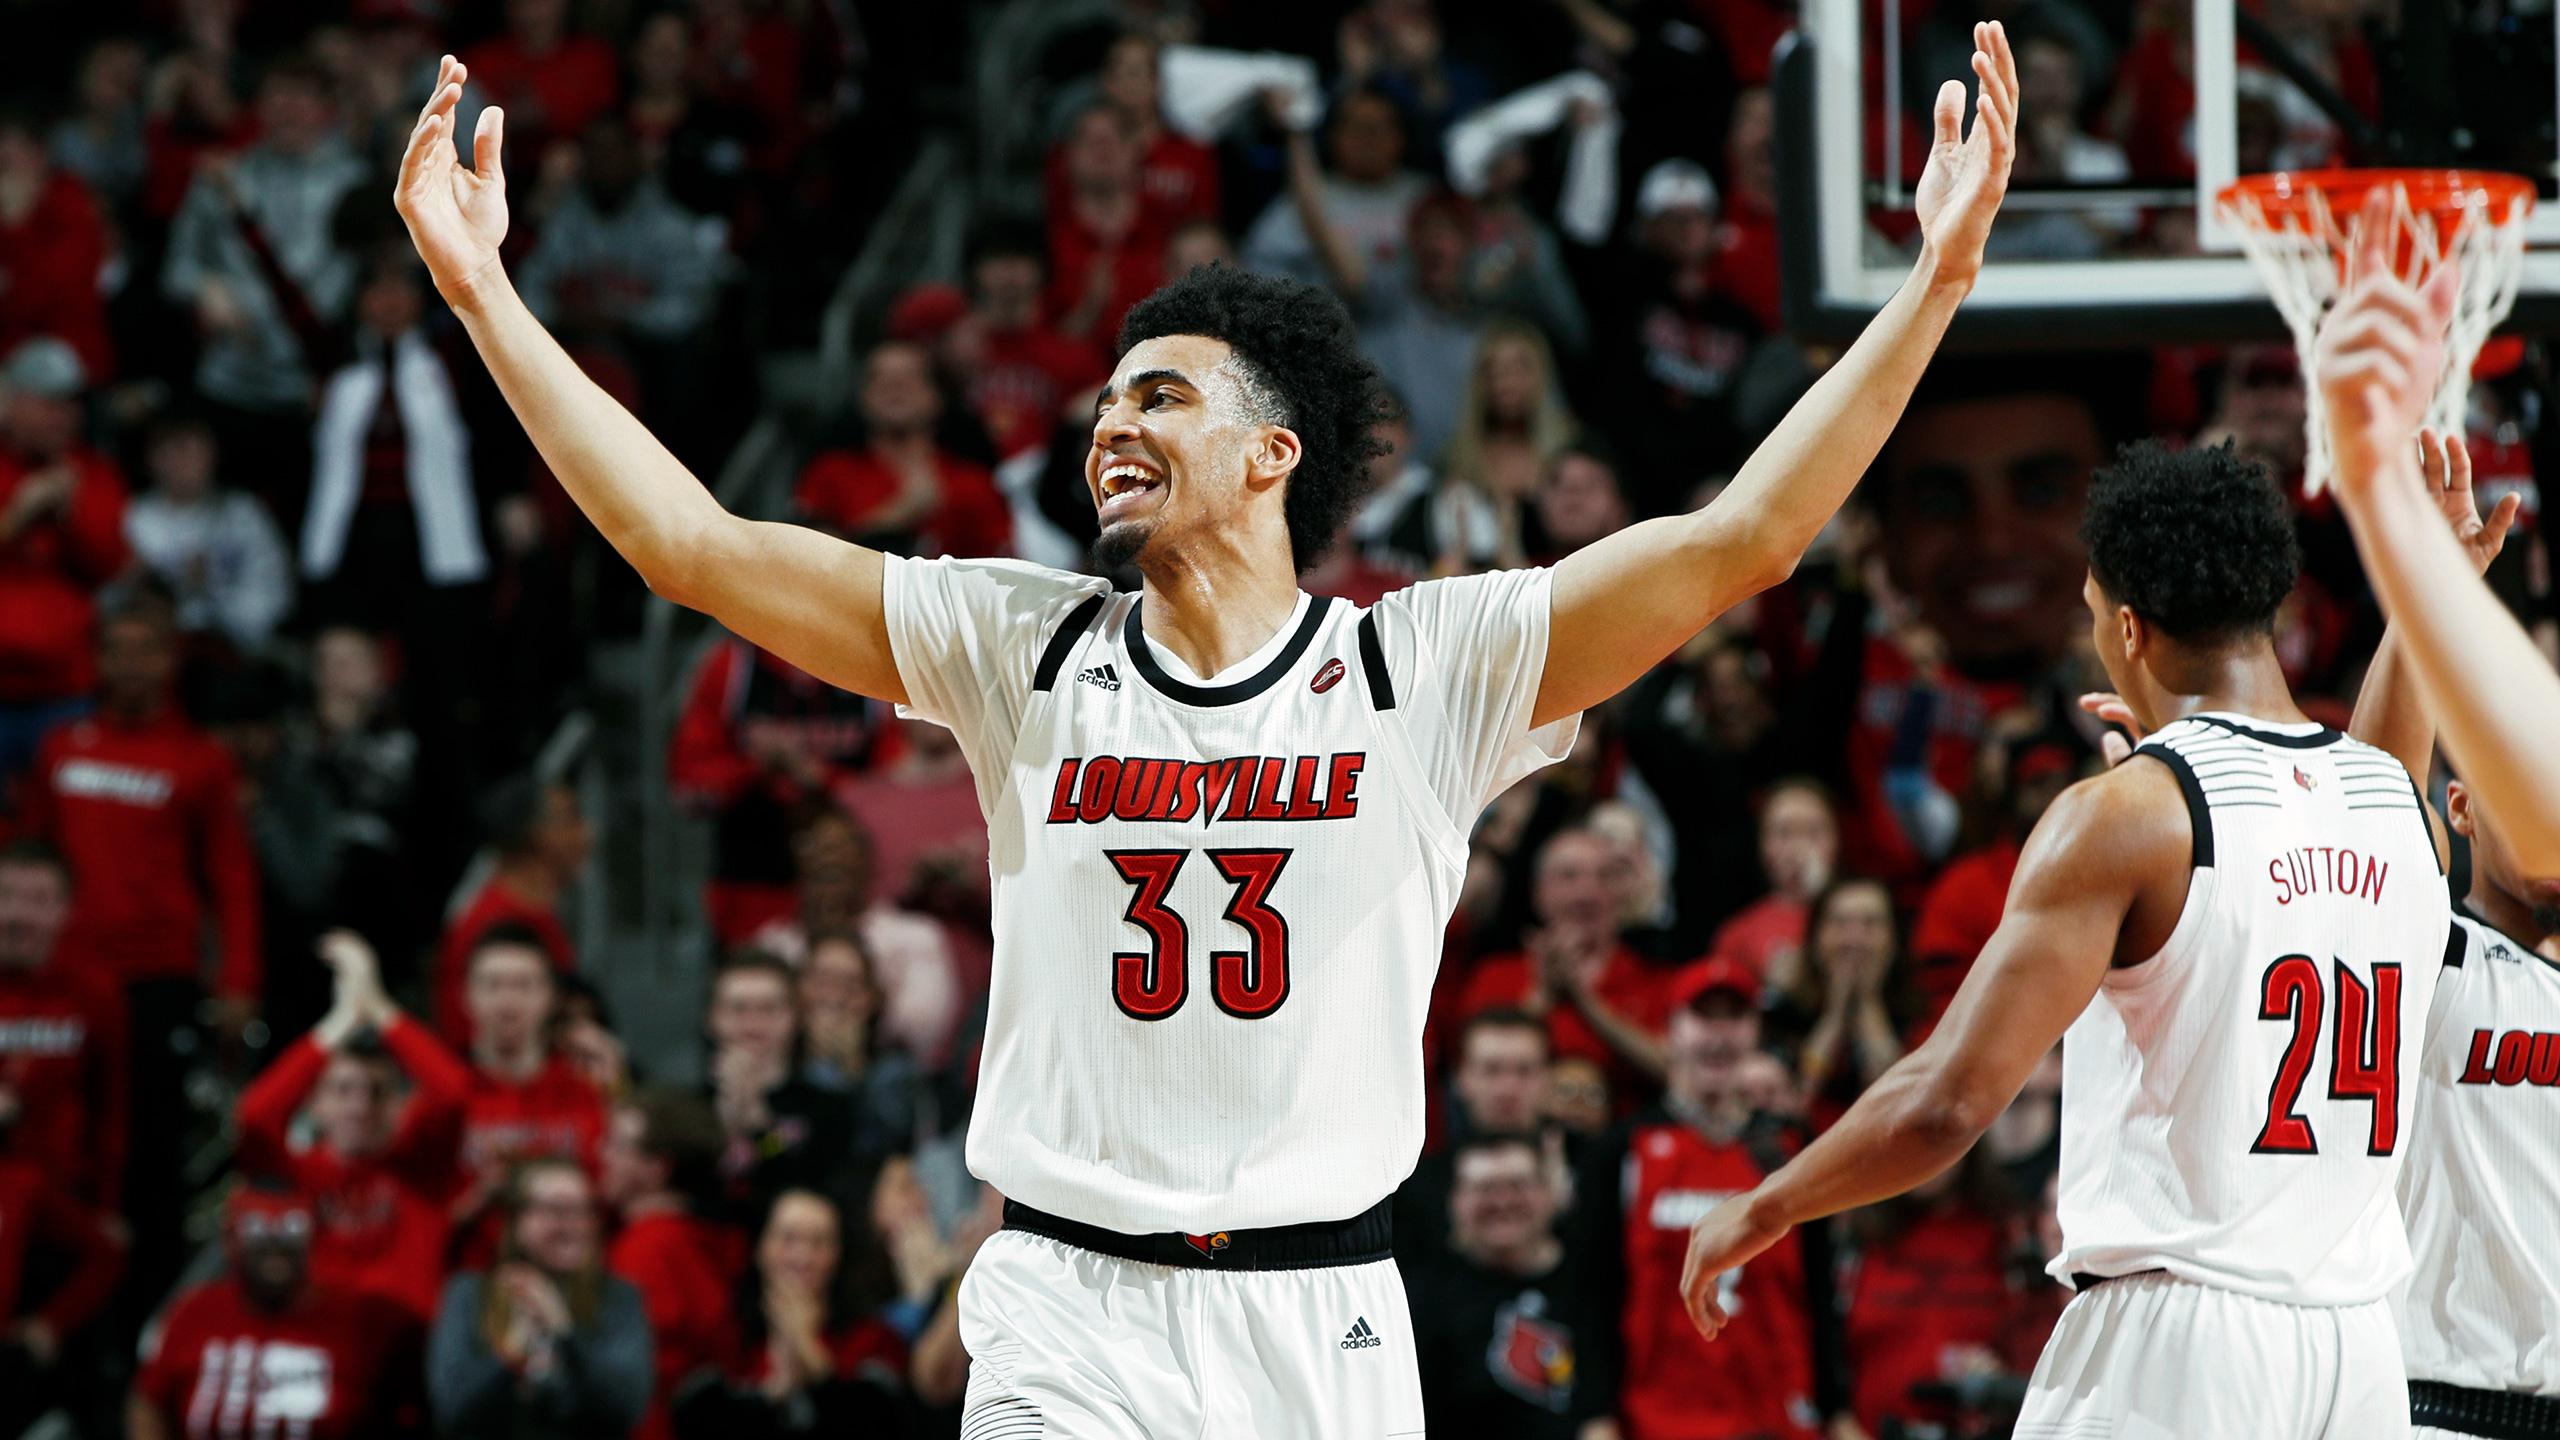 Clemson vs. #16 Louisville (M Basketball)